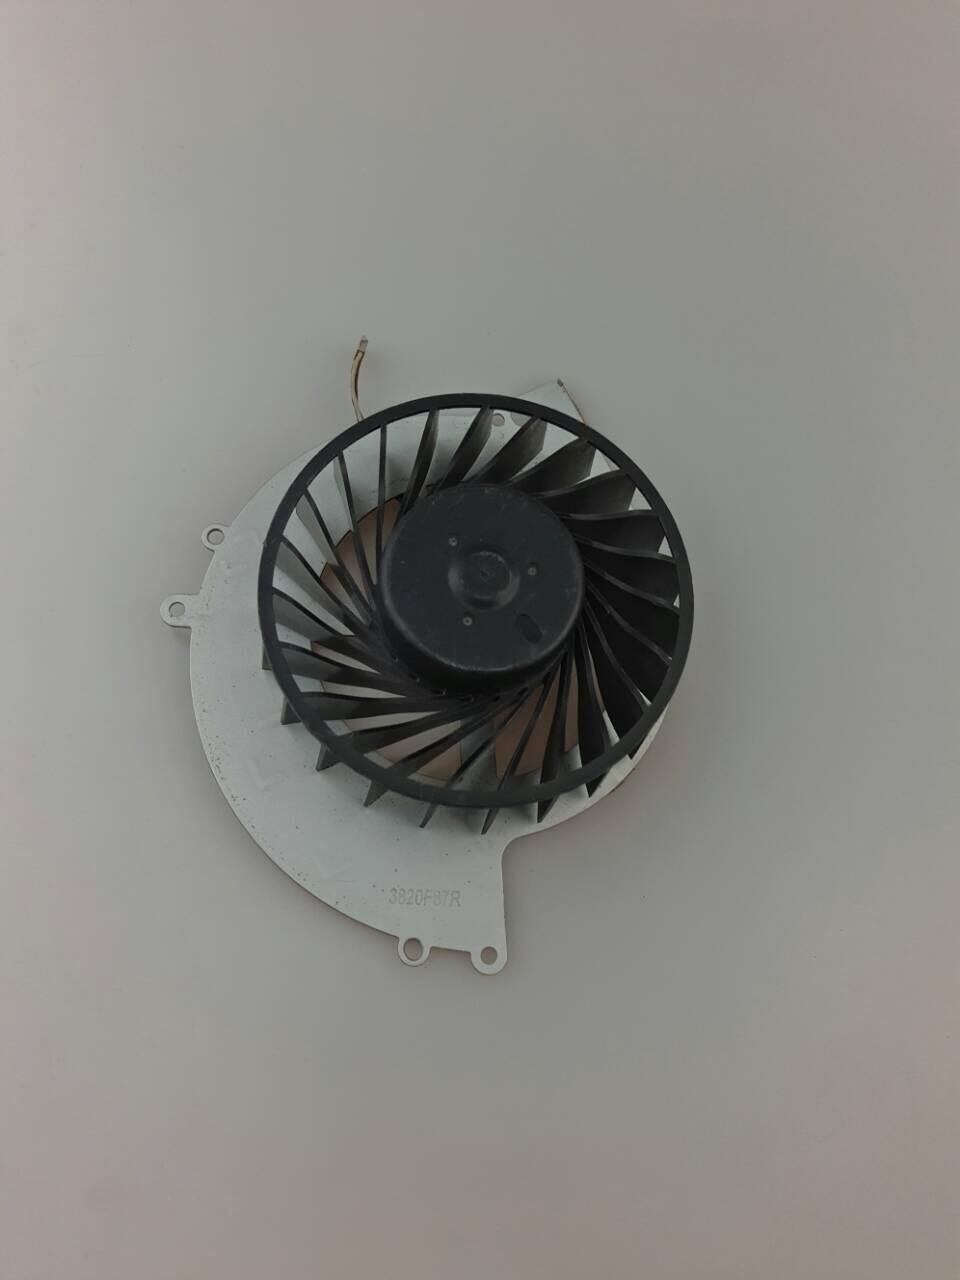 Вентилятор внутренний PS4 (KSB0912HE) (CK2MC) Оригинал-thumb